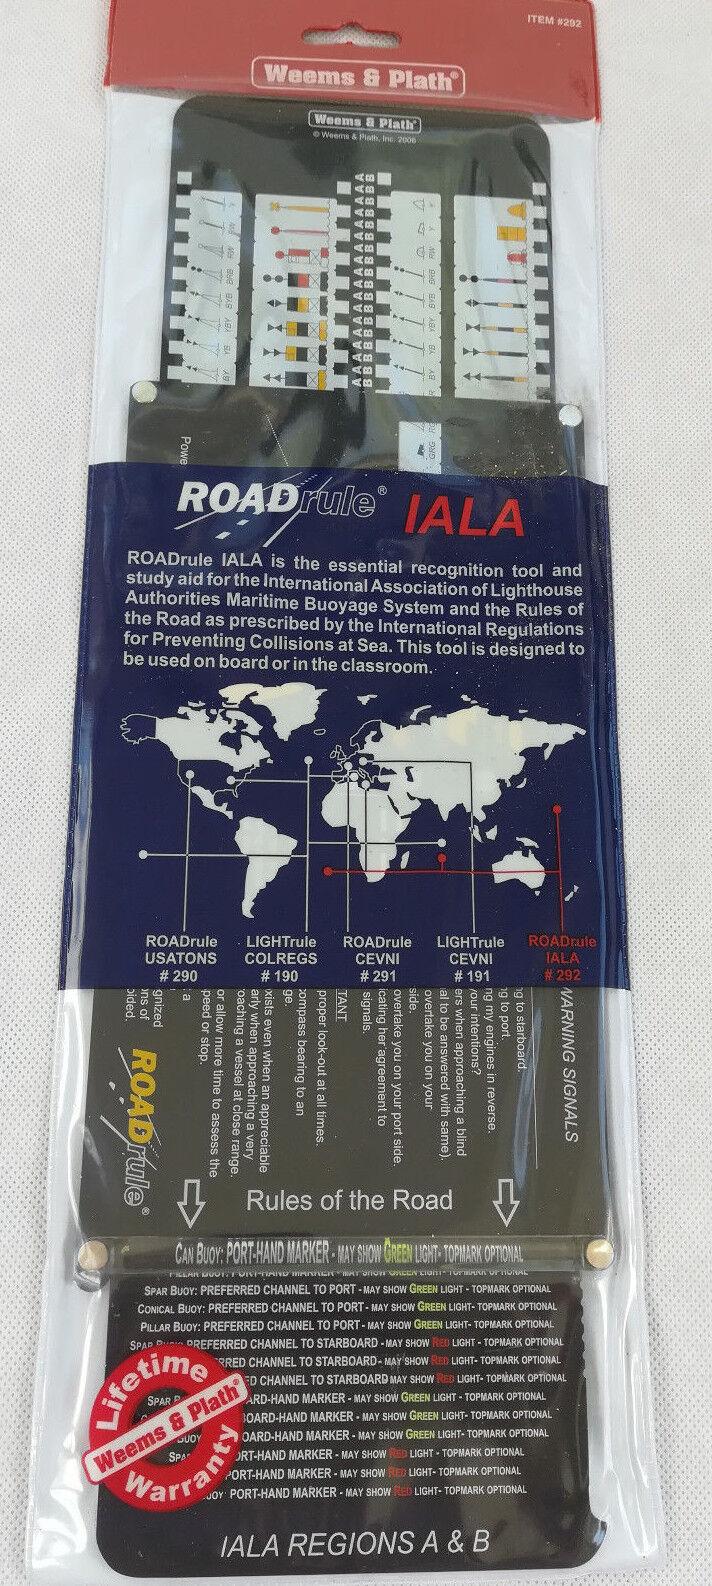 Weems & Plath Marine Navigation ROADrule Marine Navigation Aids, IALA